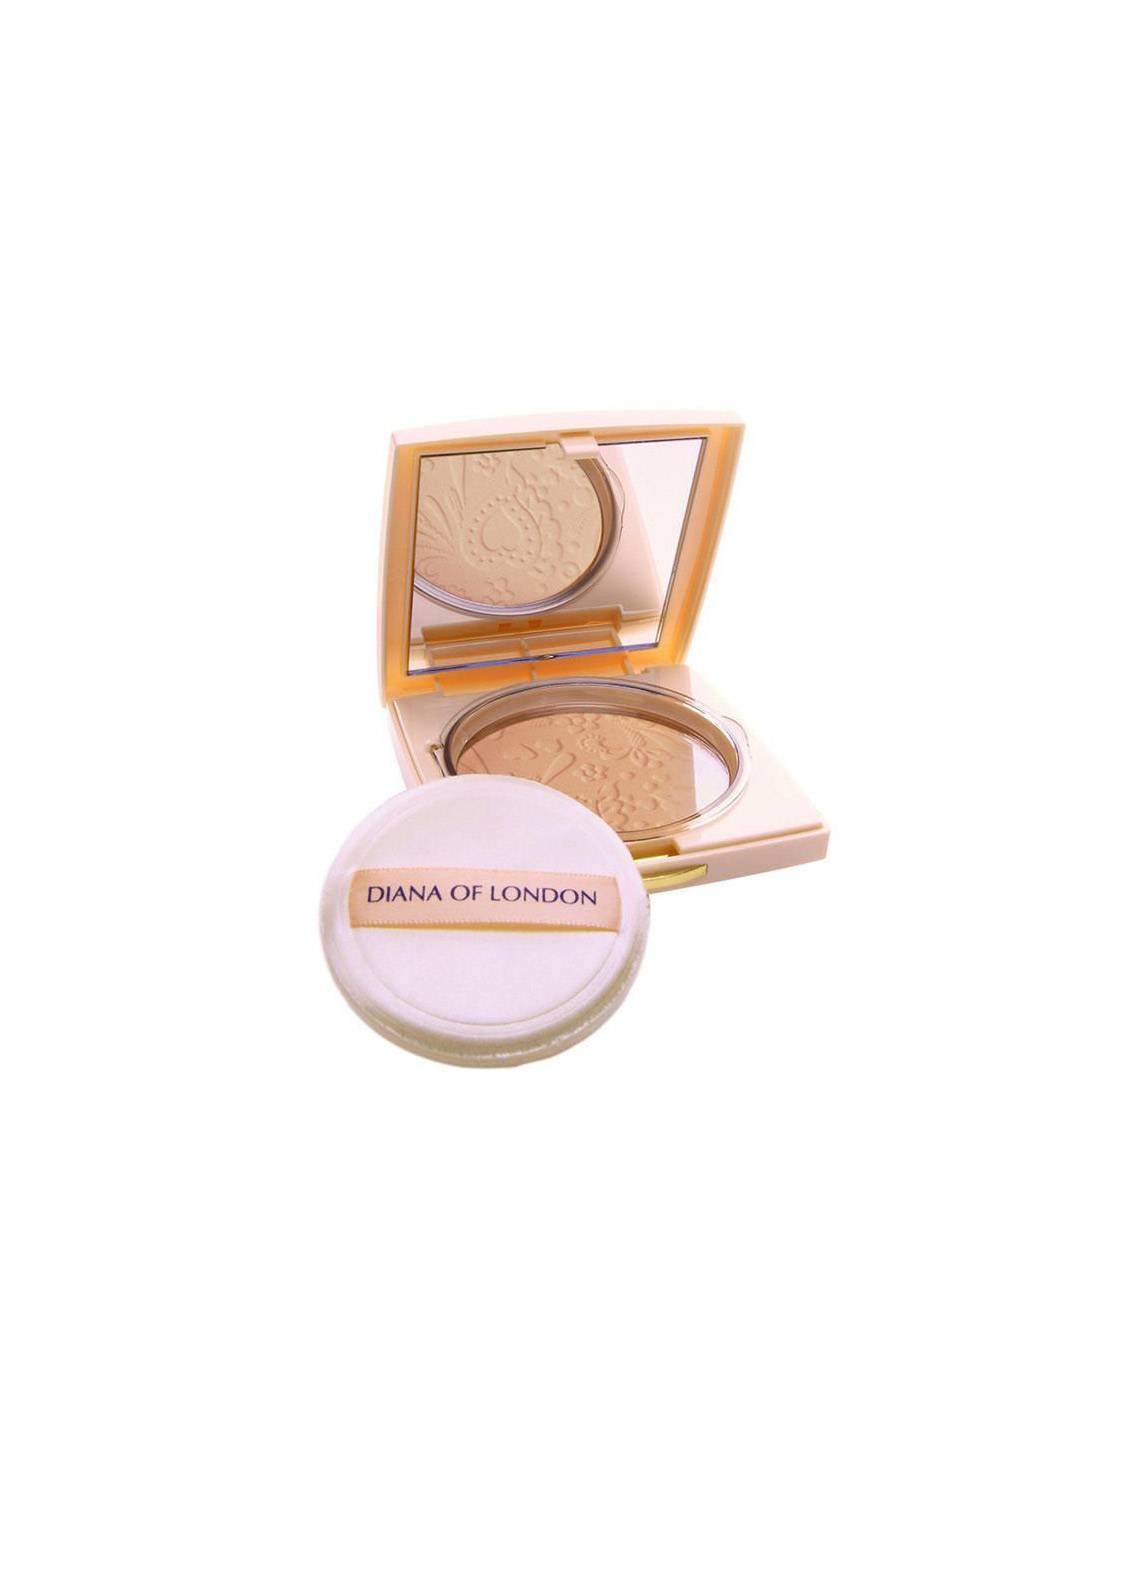 Diana Of London Absolute Compact Powder - Rose Tan-407